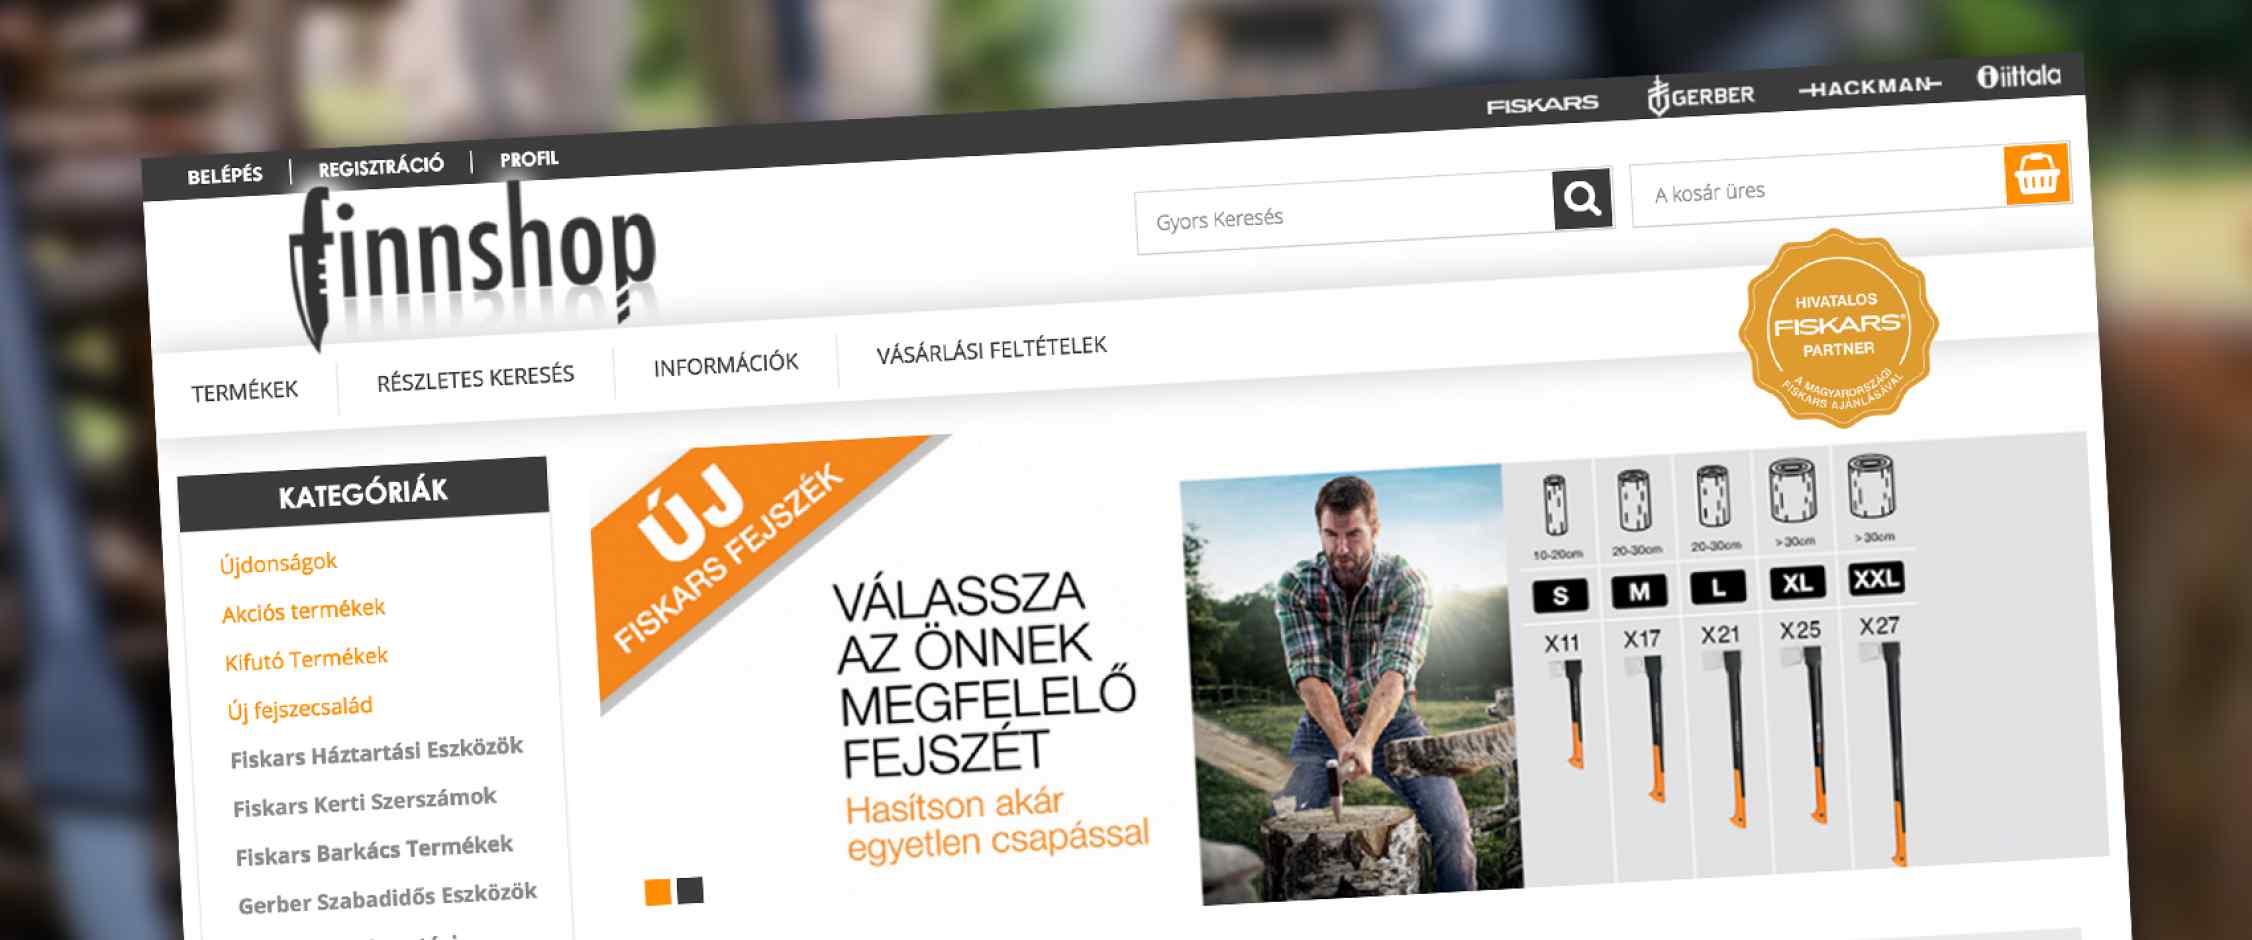 Finnshop webáruház design